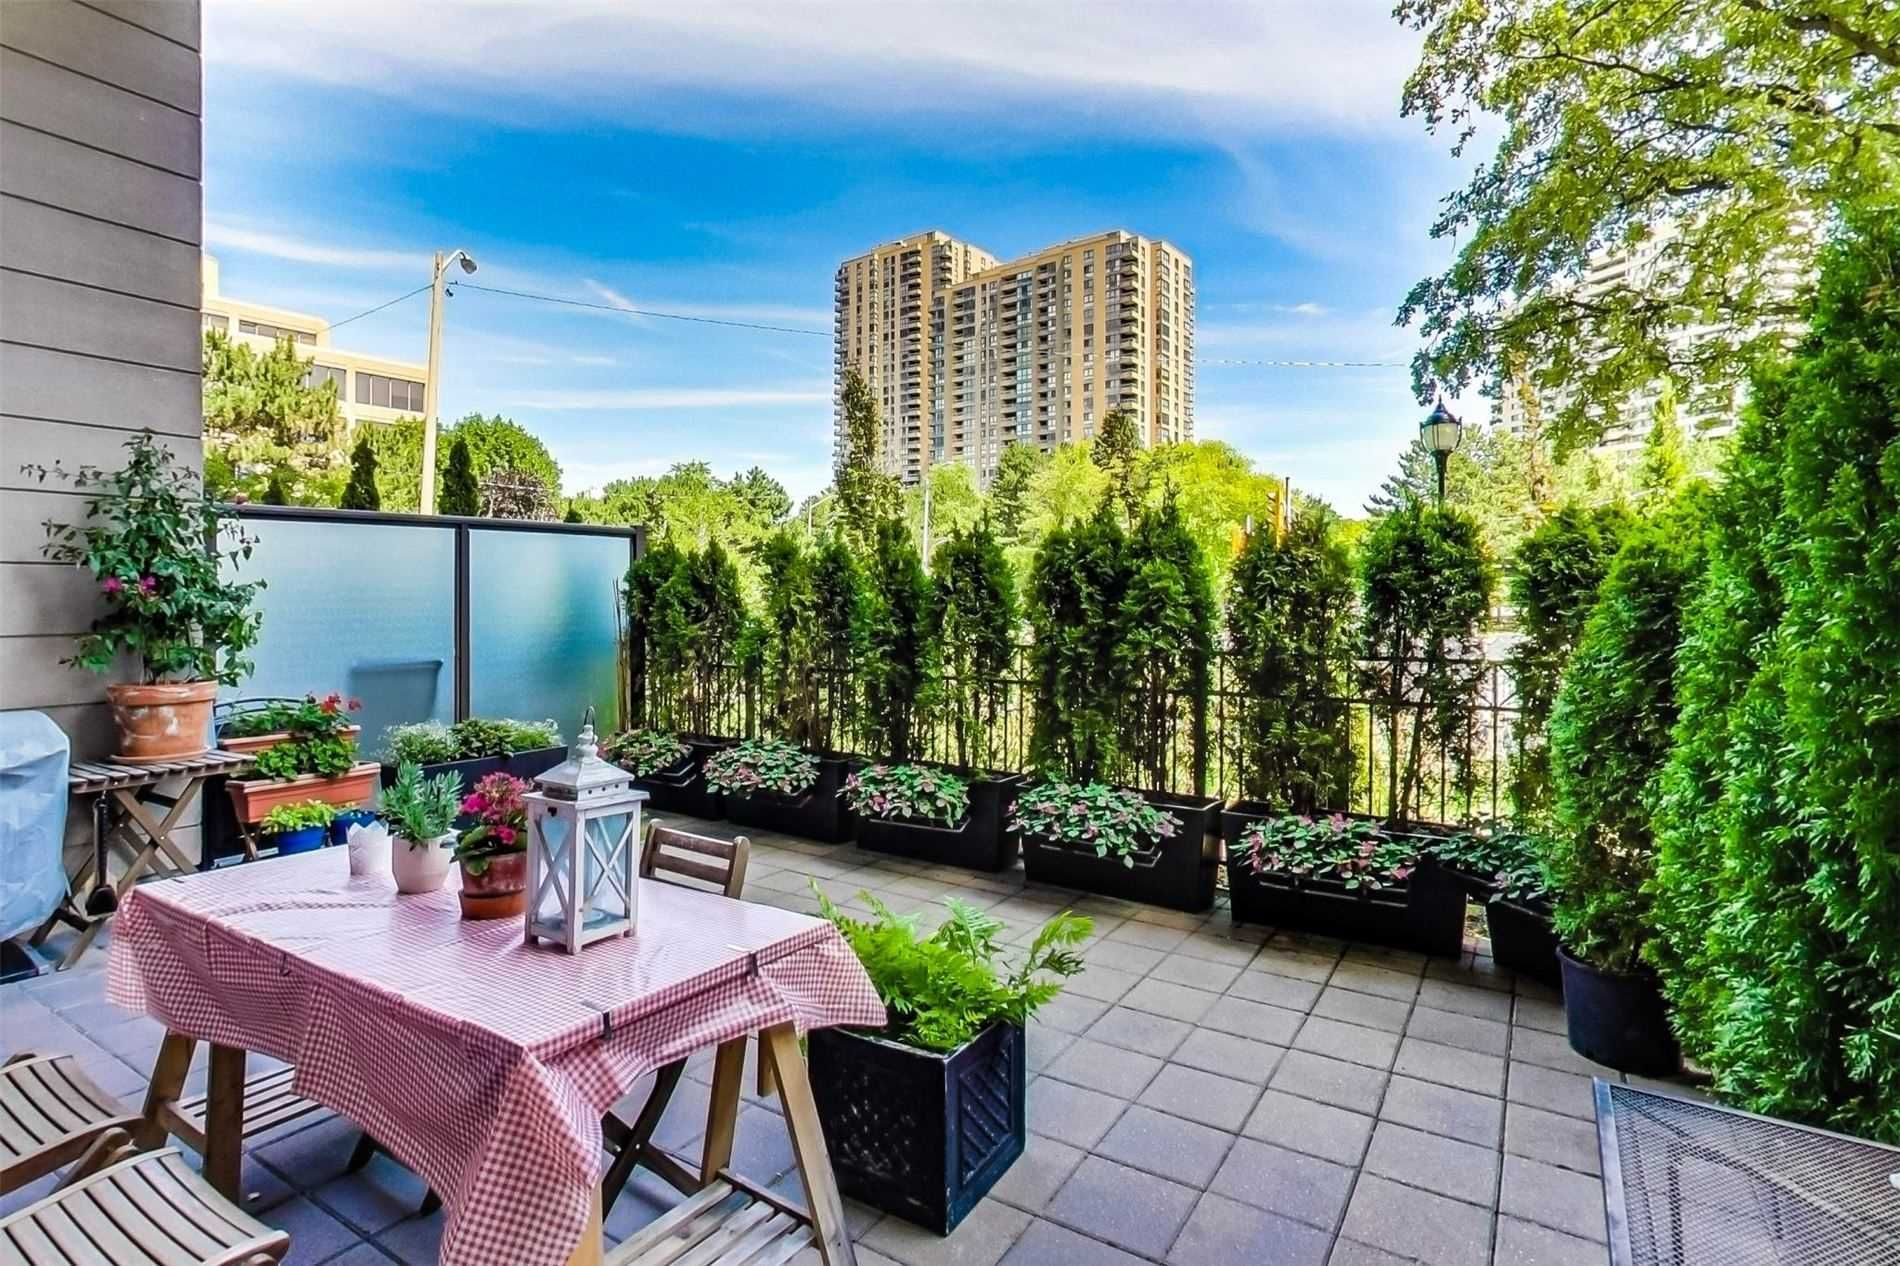 Main Photo: 105 133 Wynford Drive in Toronto: Banbury-Don Mills Condo for lease (Toronto C13)  : MLS®# C4884419